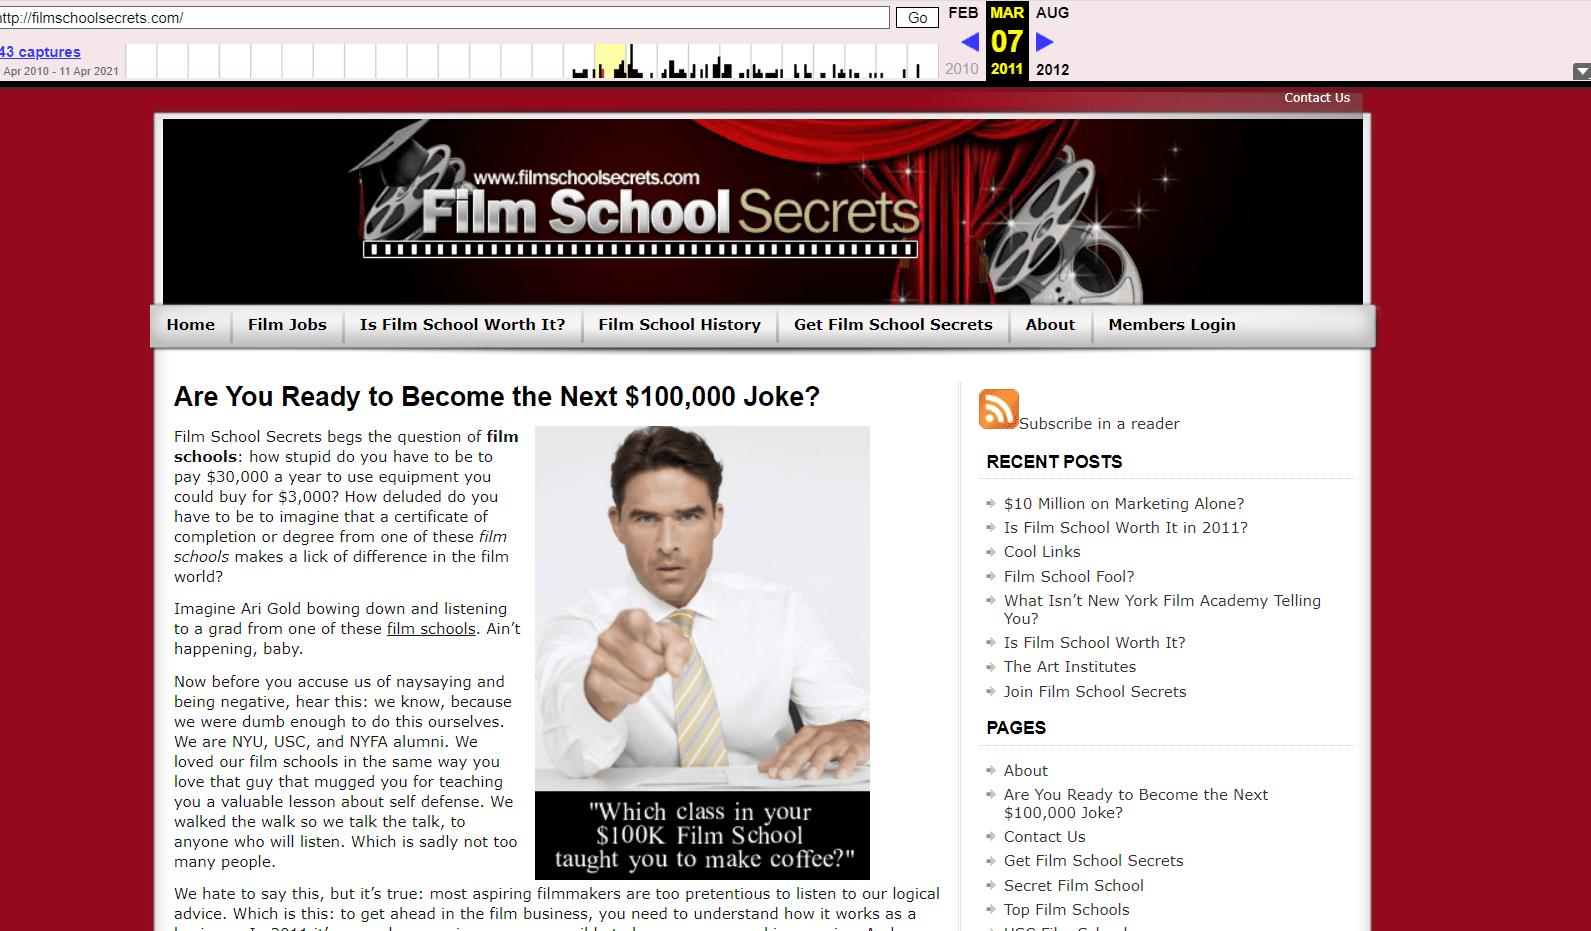 Film School Secrets Site 2011